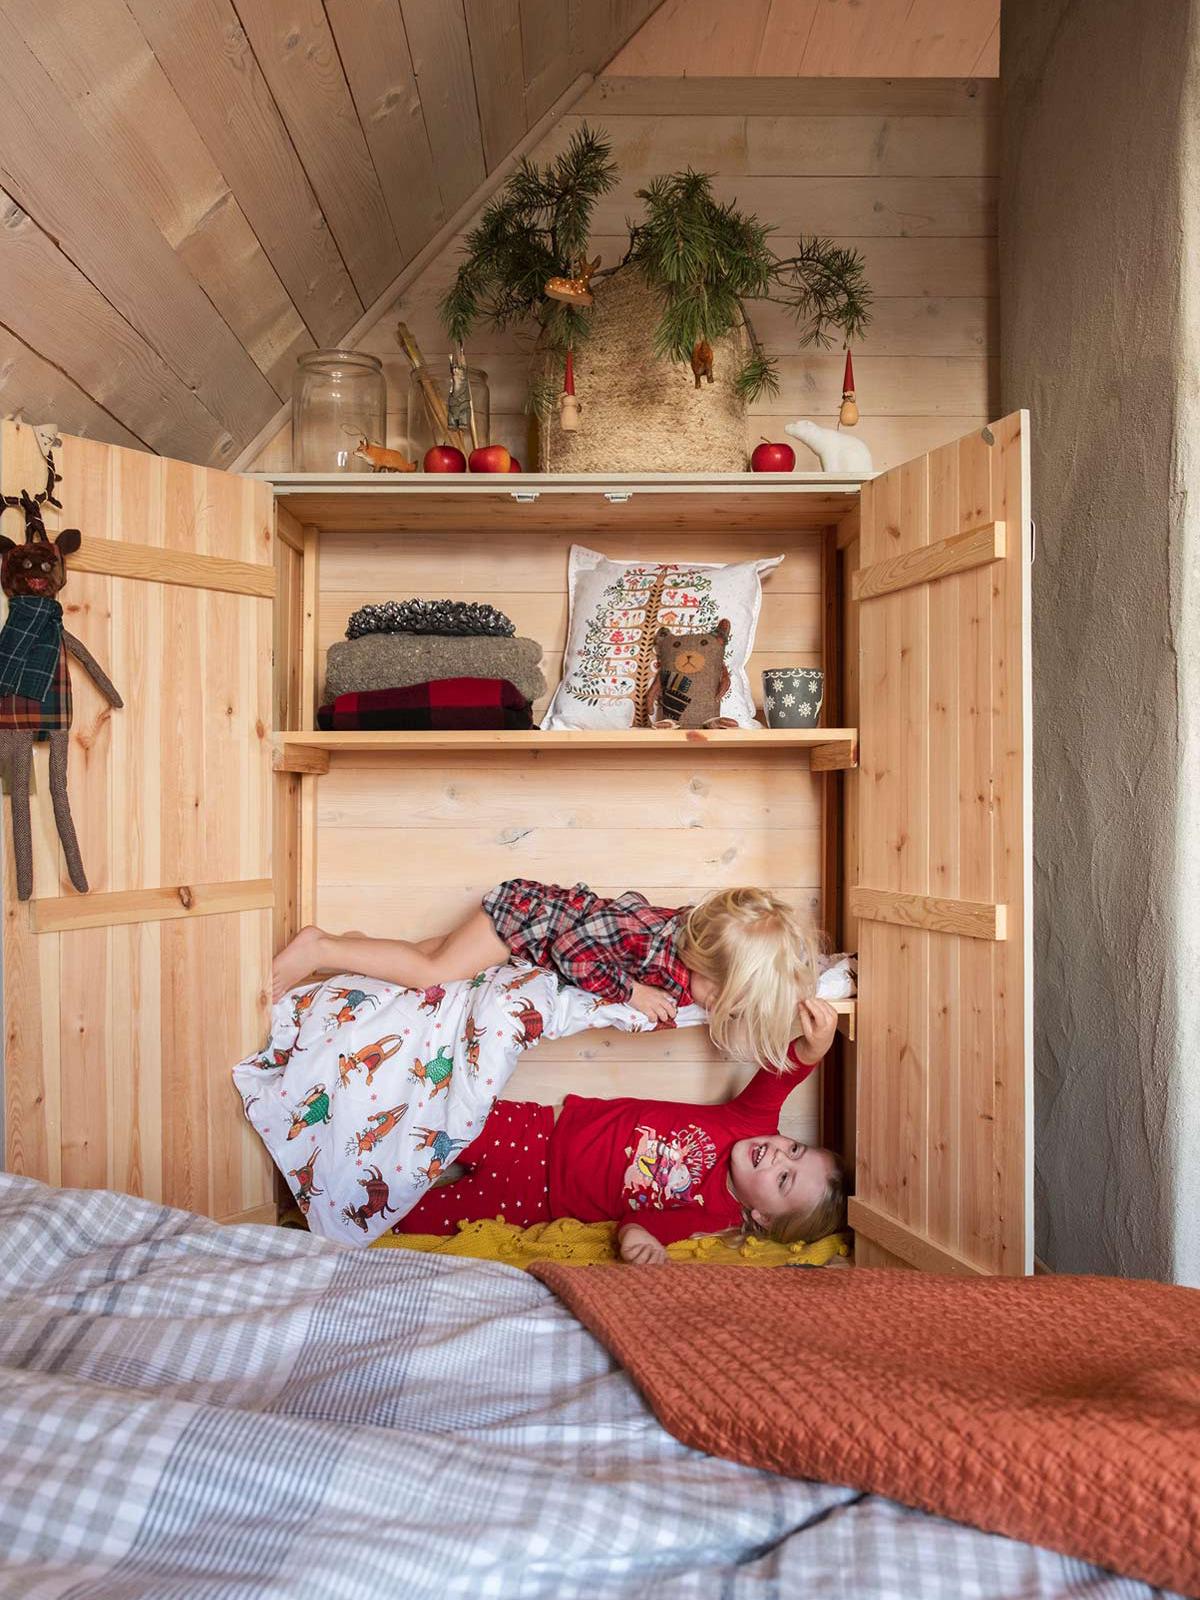 《ZARA HOME kids》2018秋冬床上用品万圣节系列Lookbook